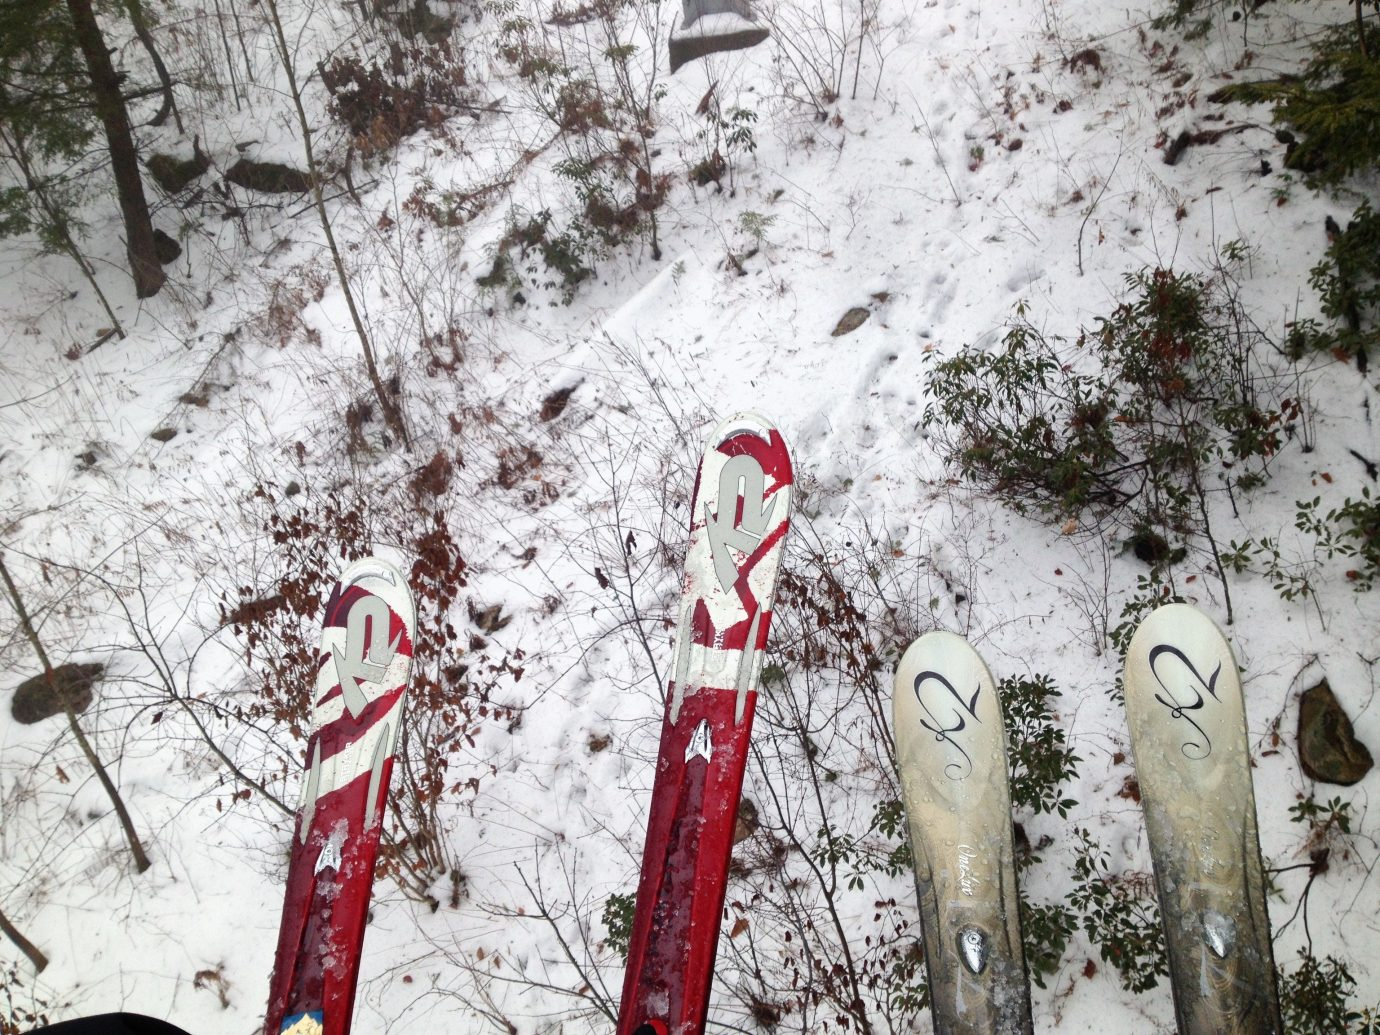 Trip Ideas snow tree outdoor Winter weather geological phenomenon season freezing branch red spring skiing slope